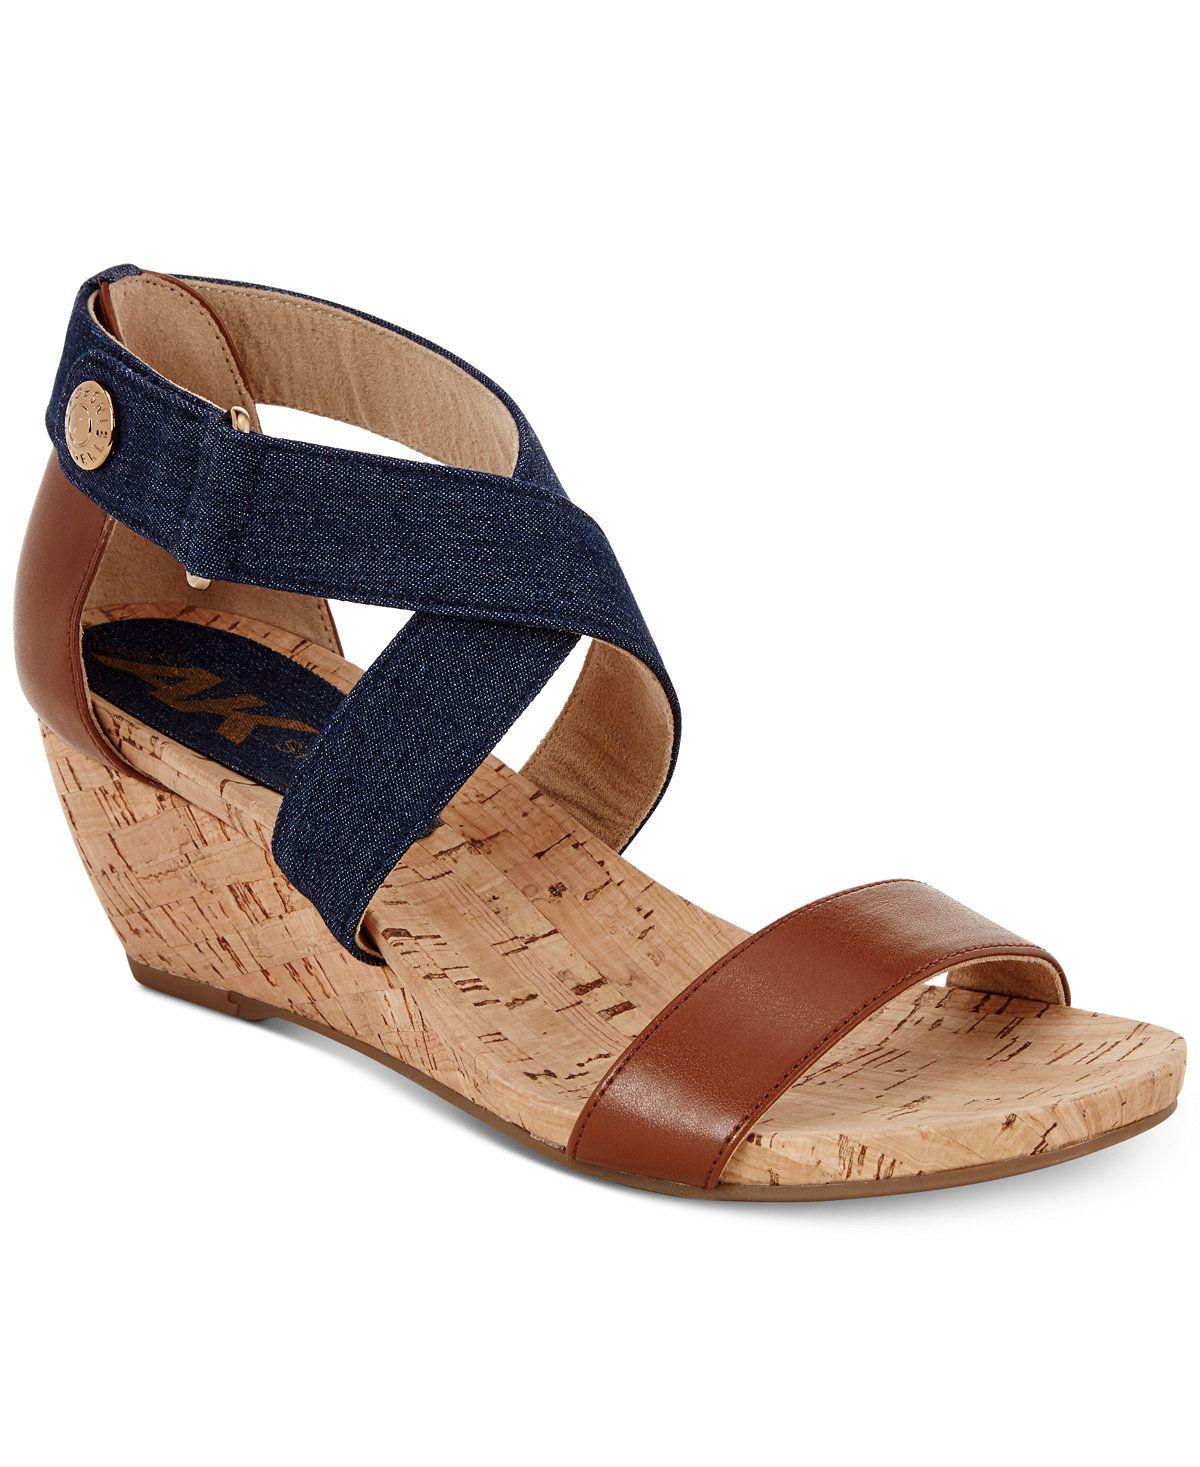 Anne Klein Sport Crisscross Wedge Sandals All Women's